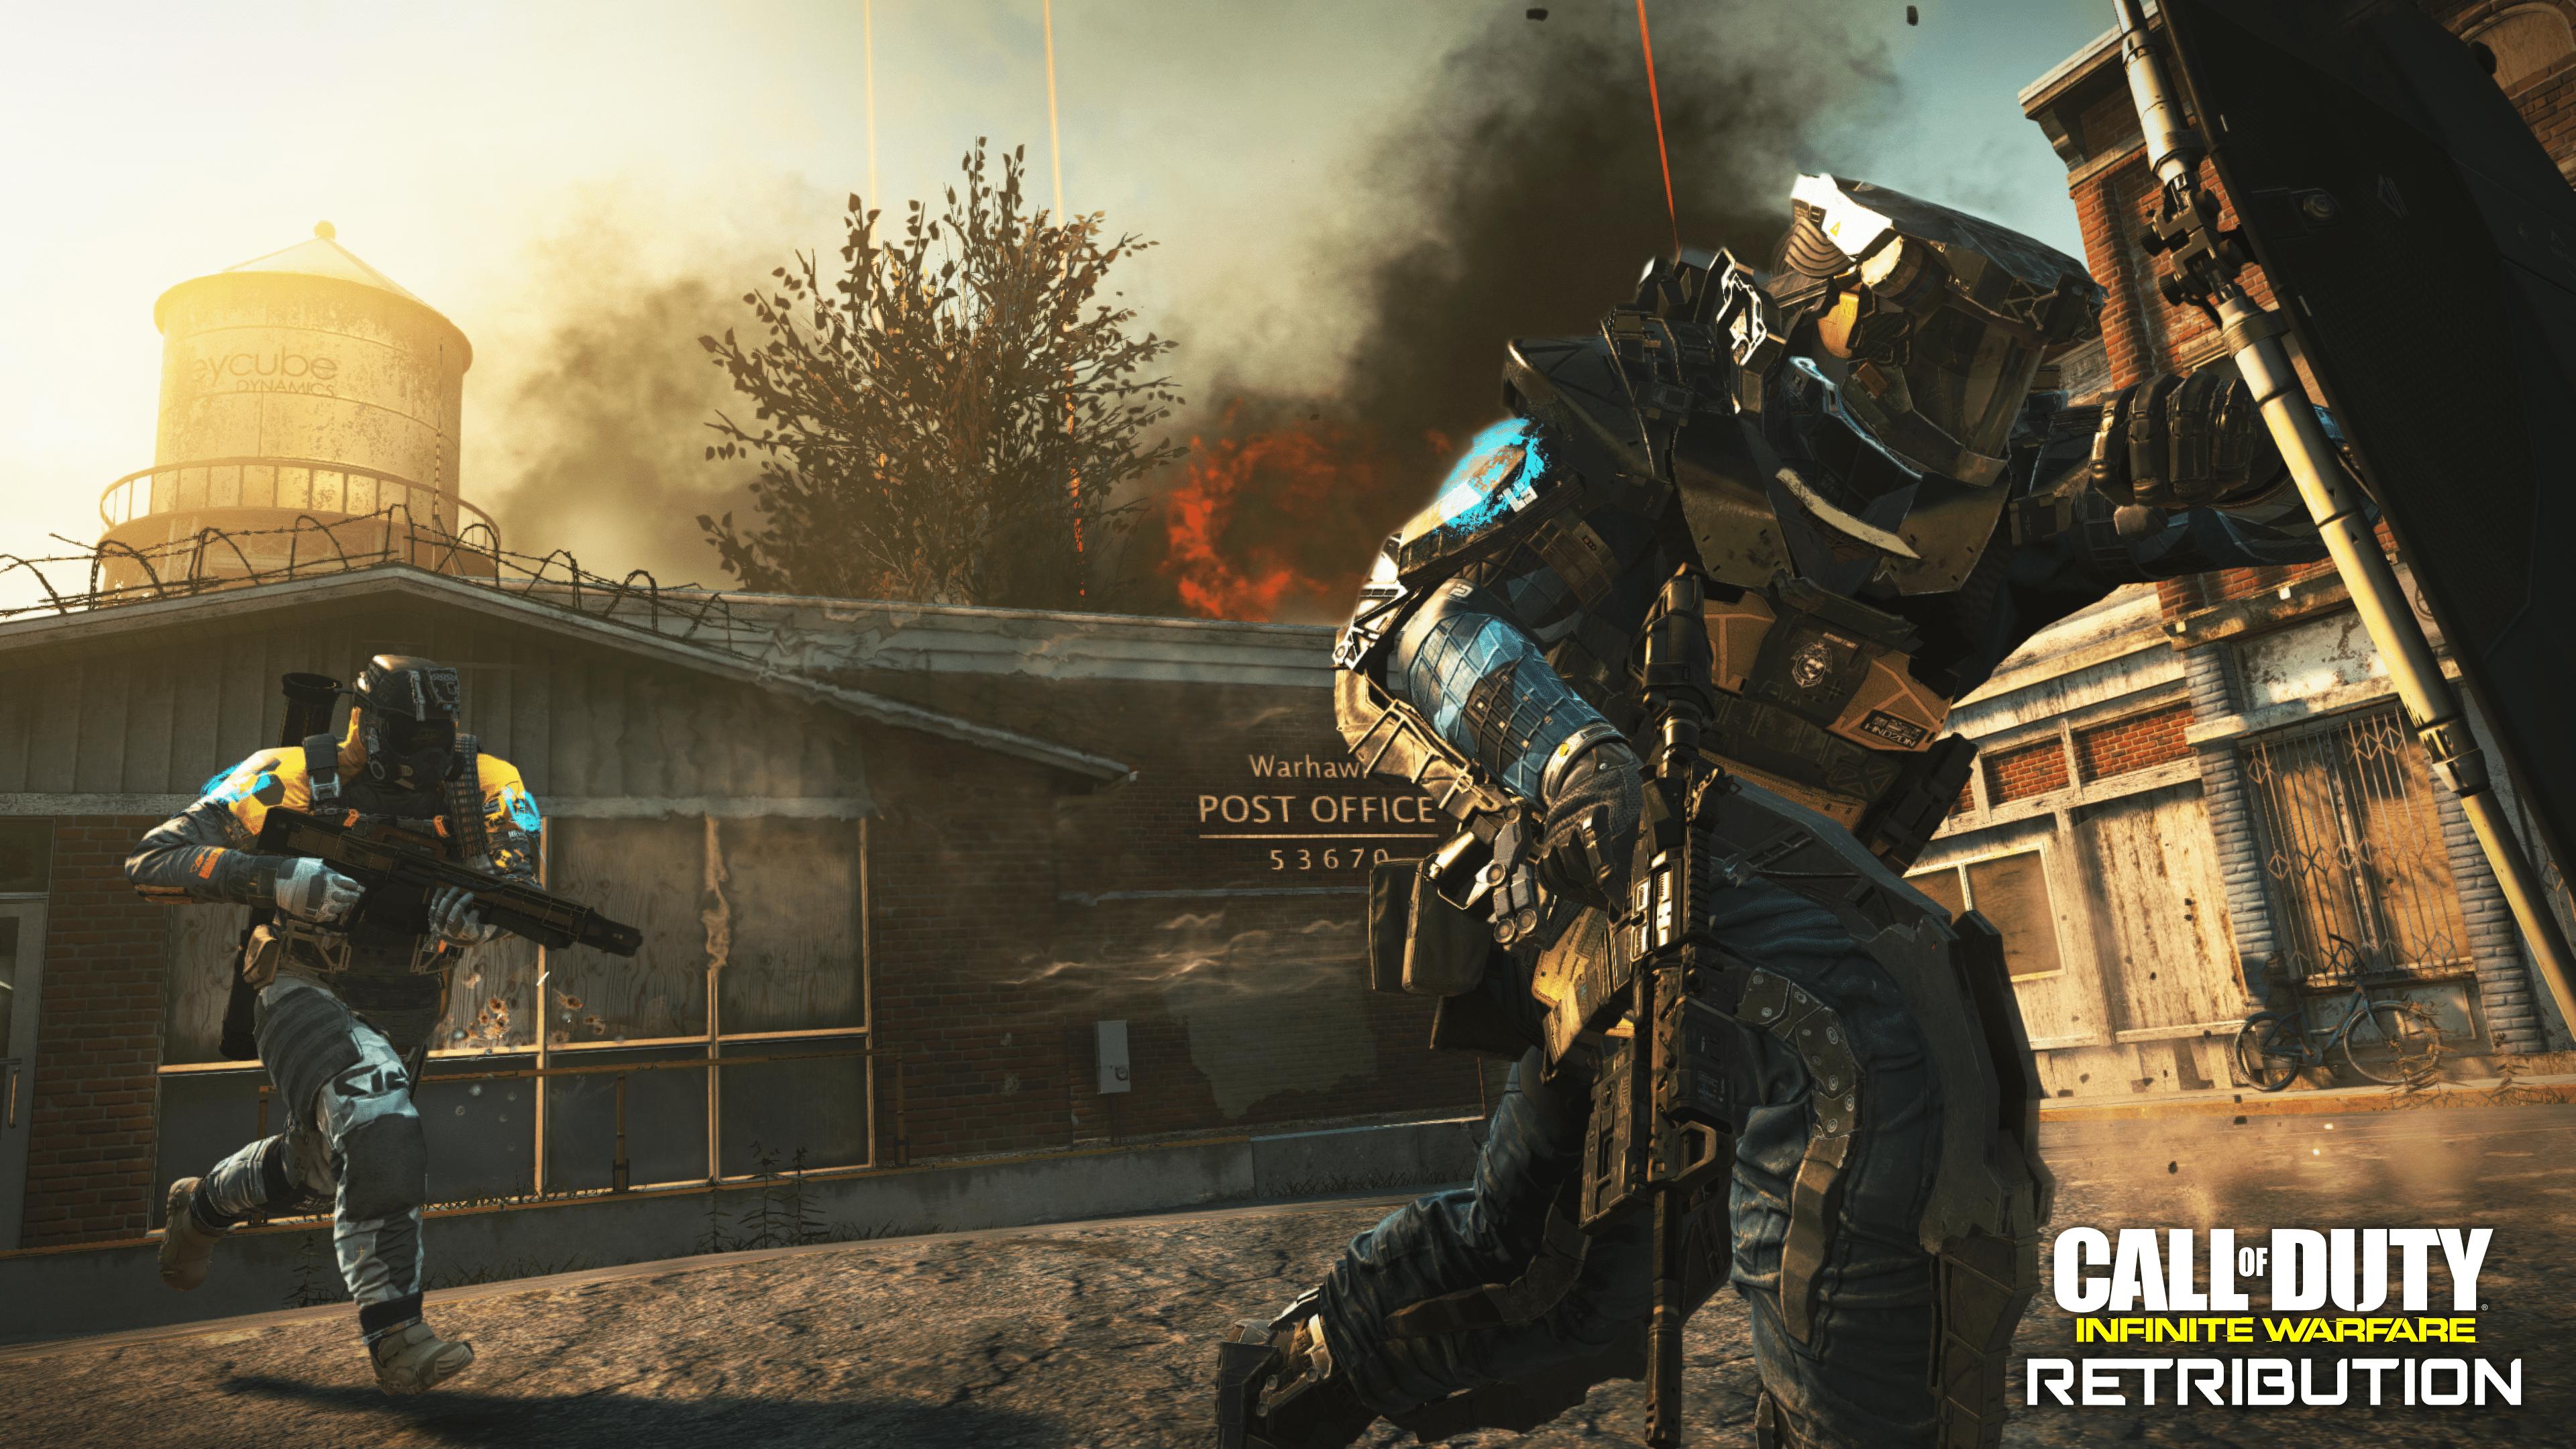 Call of Duty: Infinite Warfare - Retribution Xbox